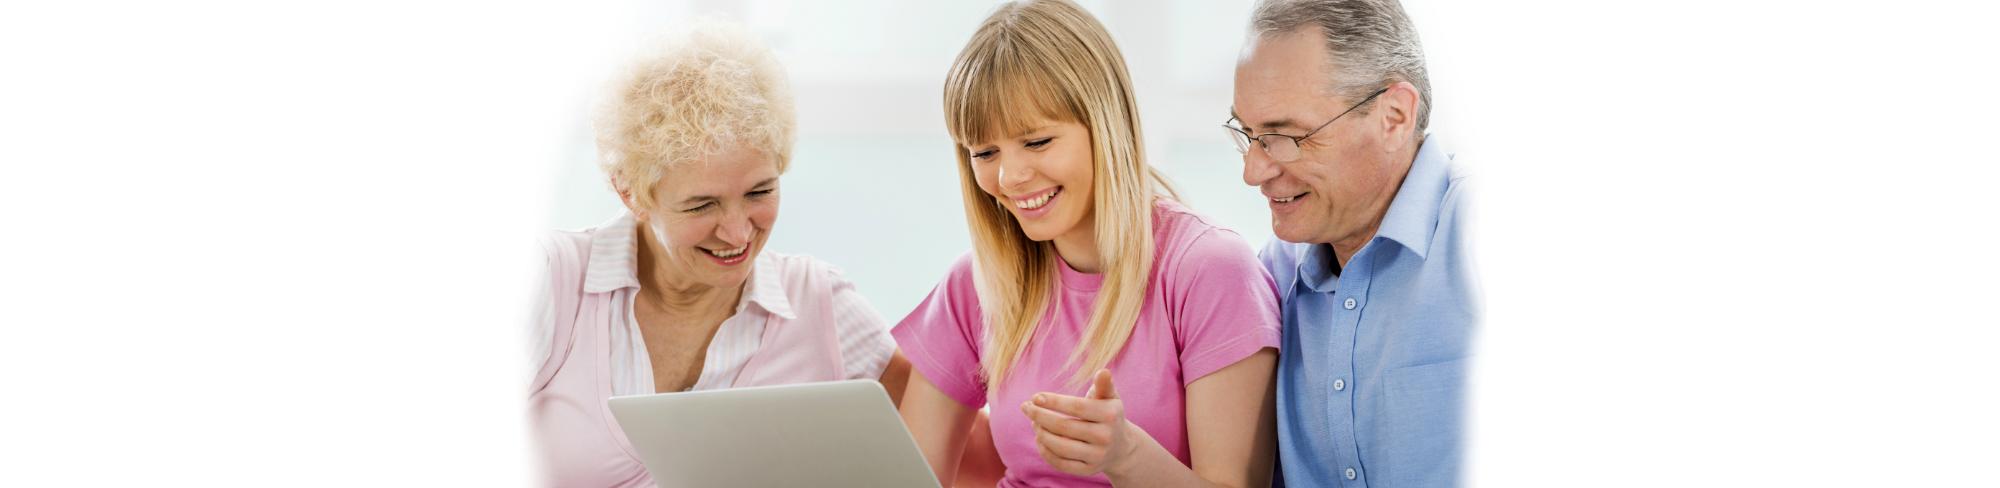 pension_seniors_on_computer_slider_image.png